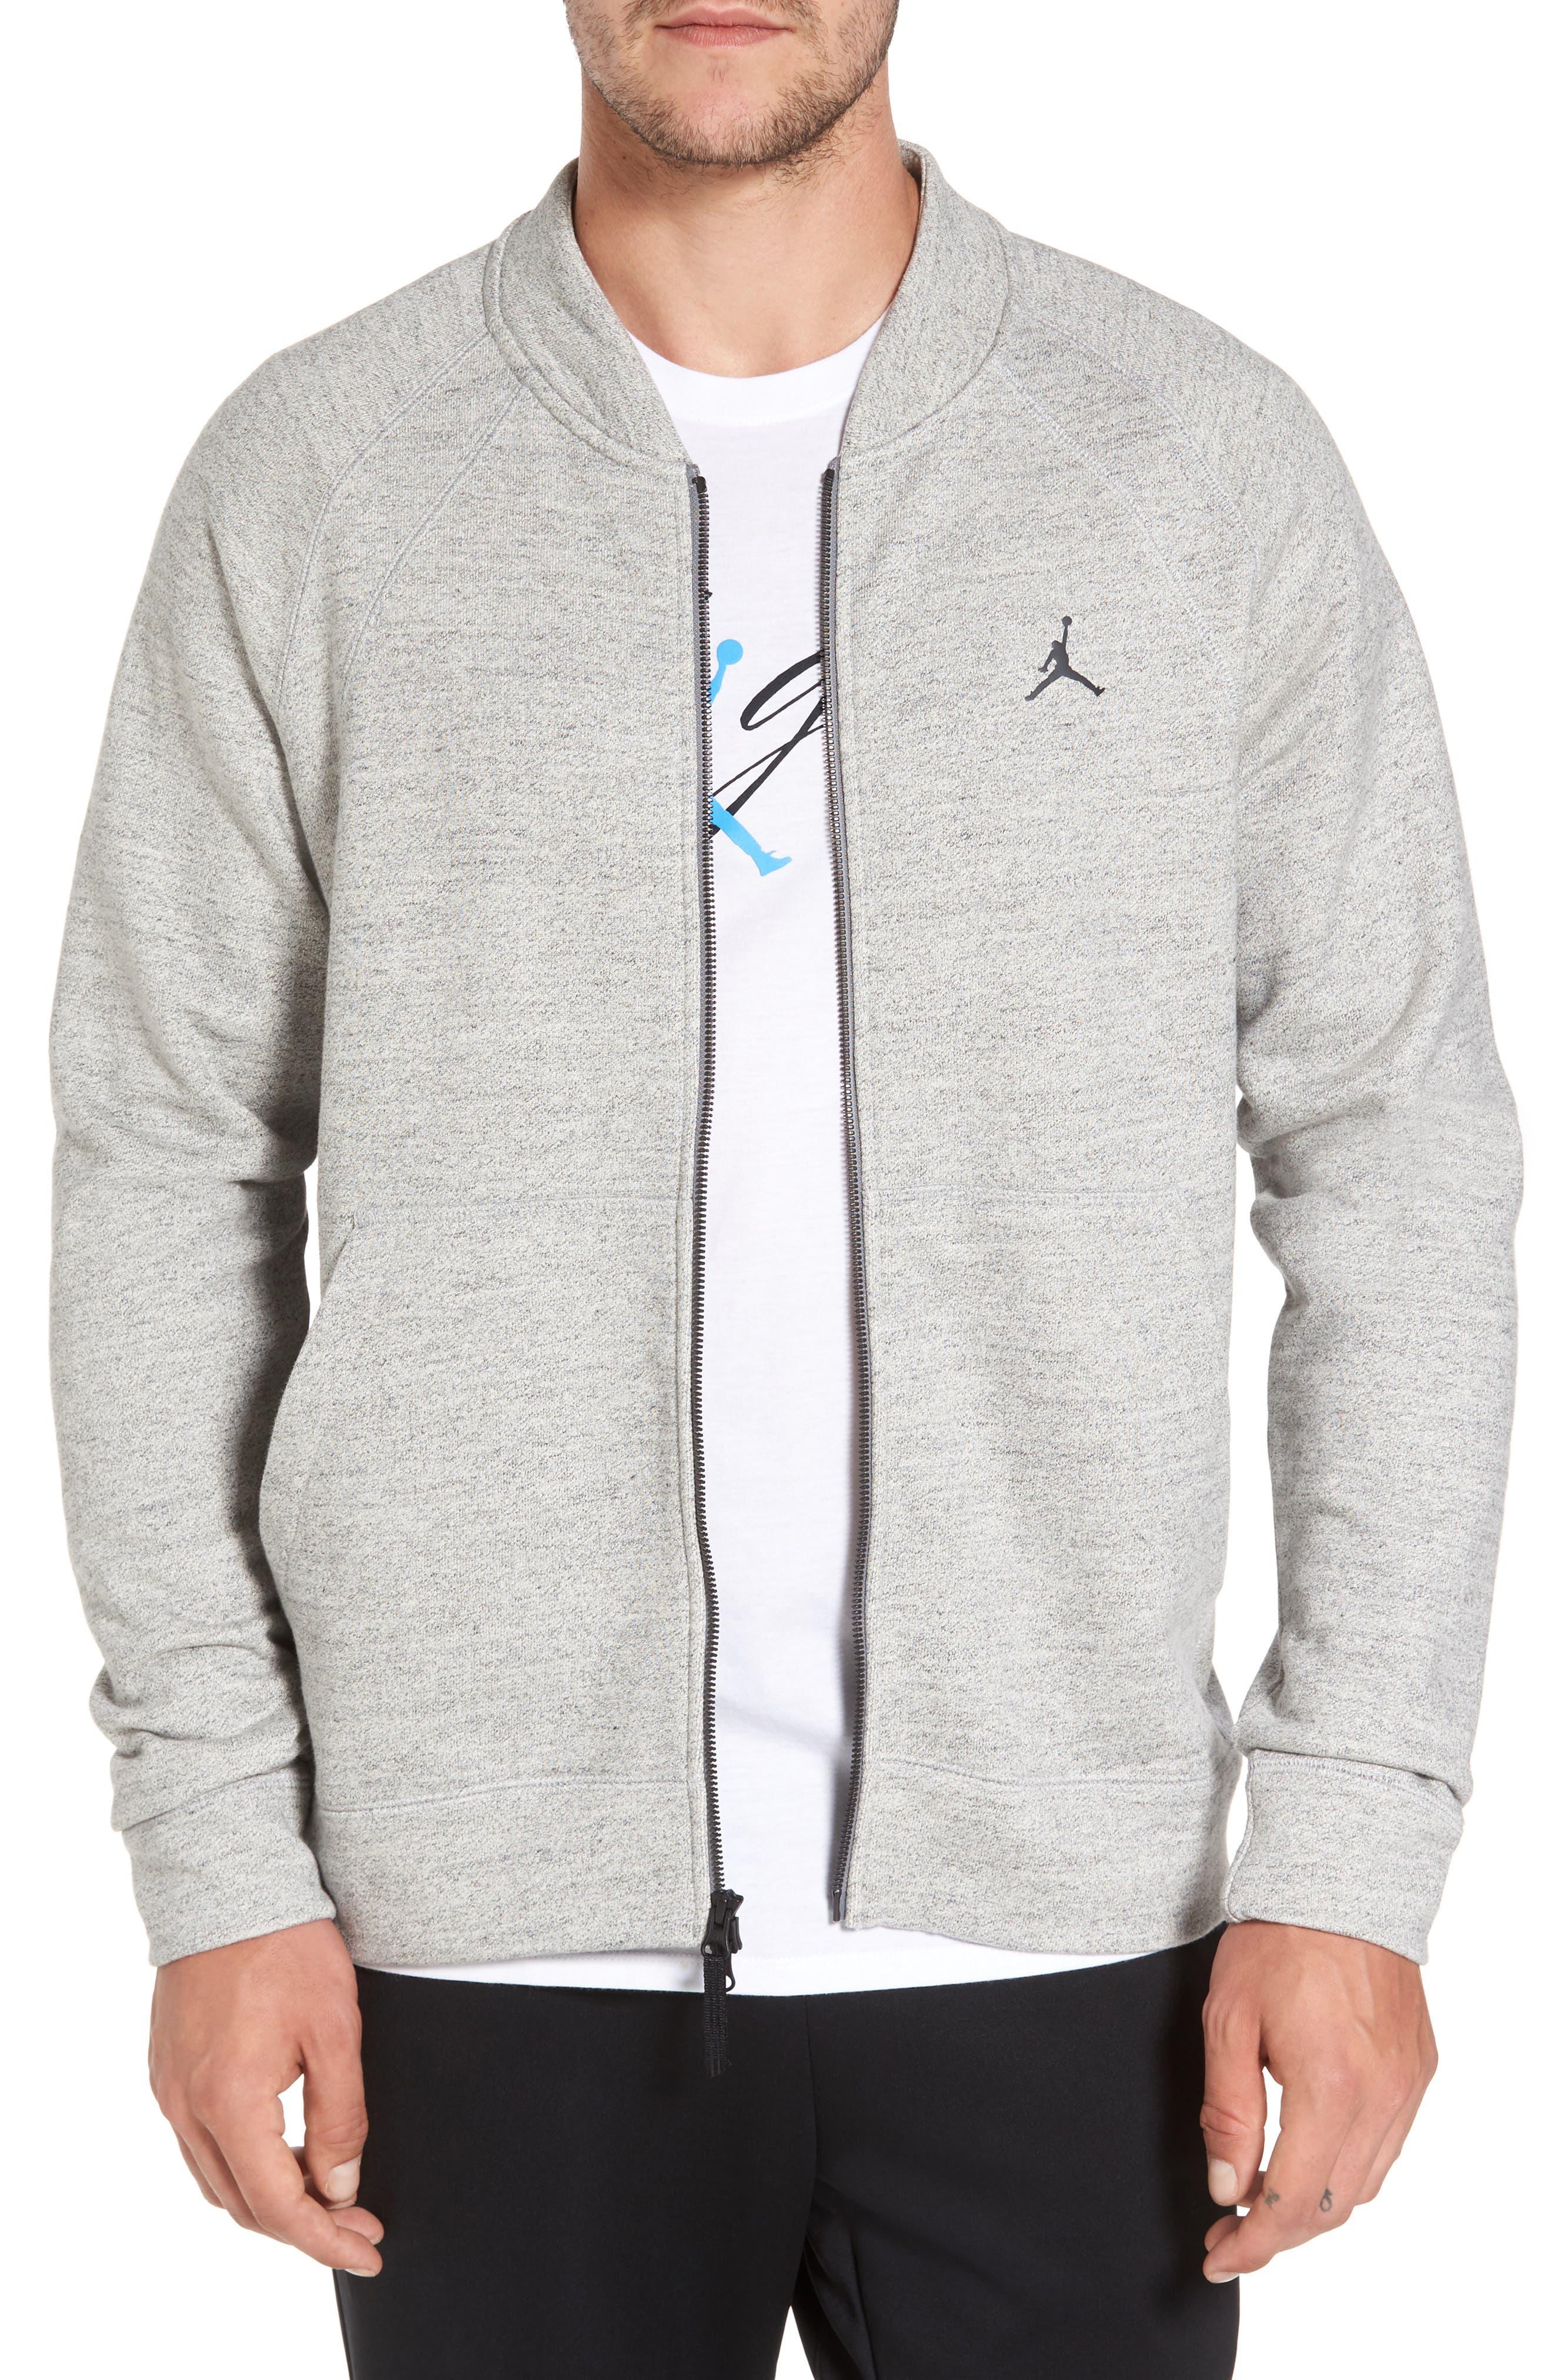 Sportswear Wings Fleece Bomber Jacket,                             Main thumbnail 1, color,                             Dark Grey Heather/ Black